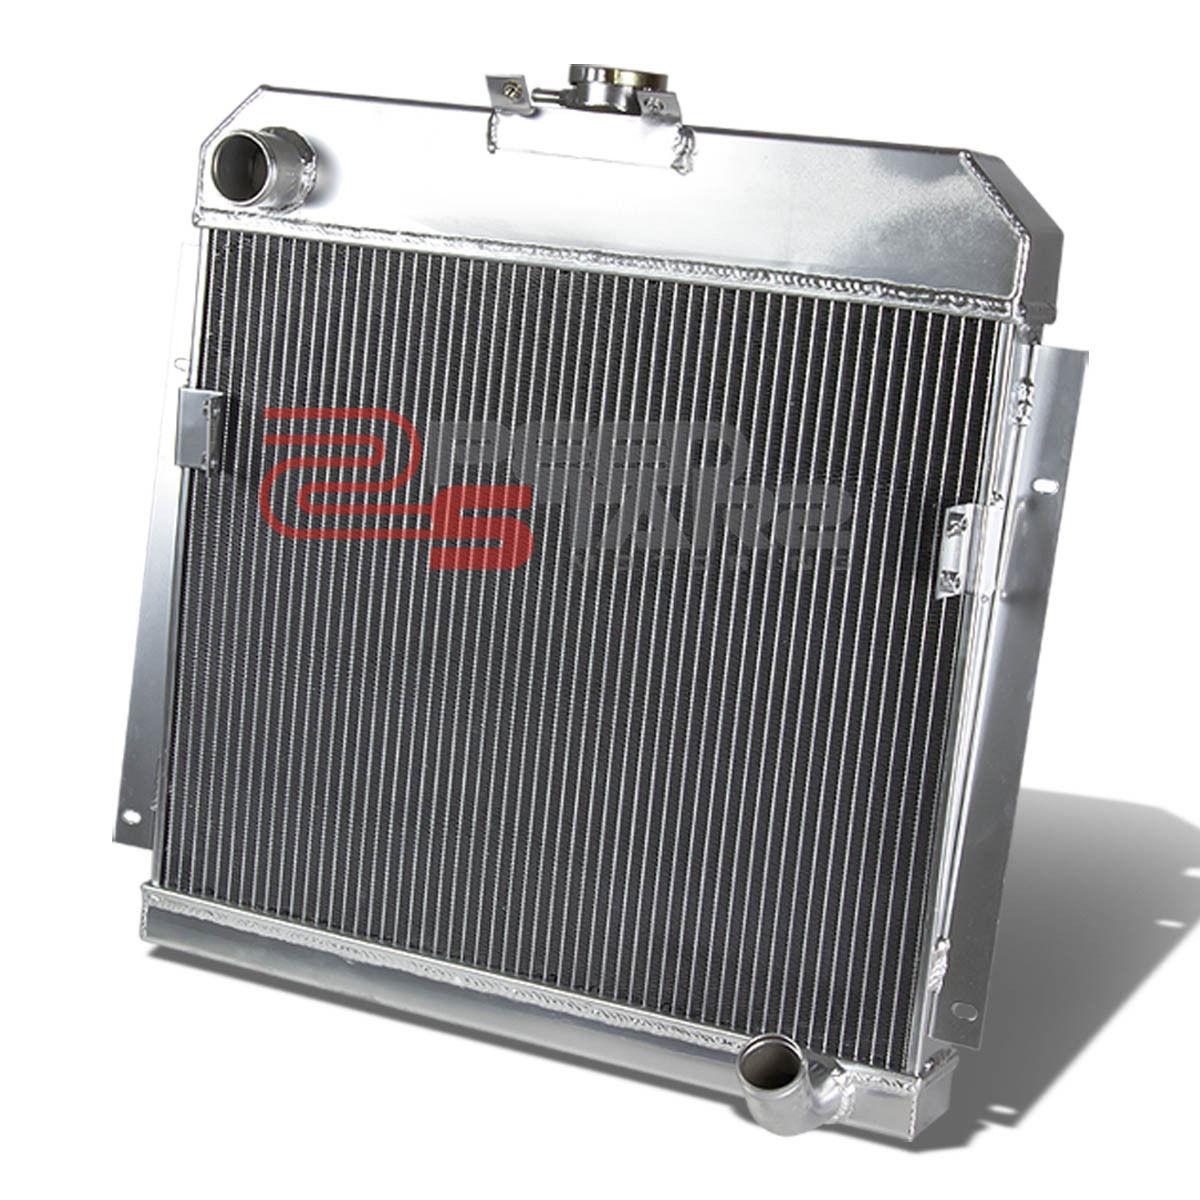 TRI Core High Capacity Race Aluminum Radiator Kit For Chevy 47-54 Truck L6 MT